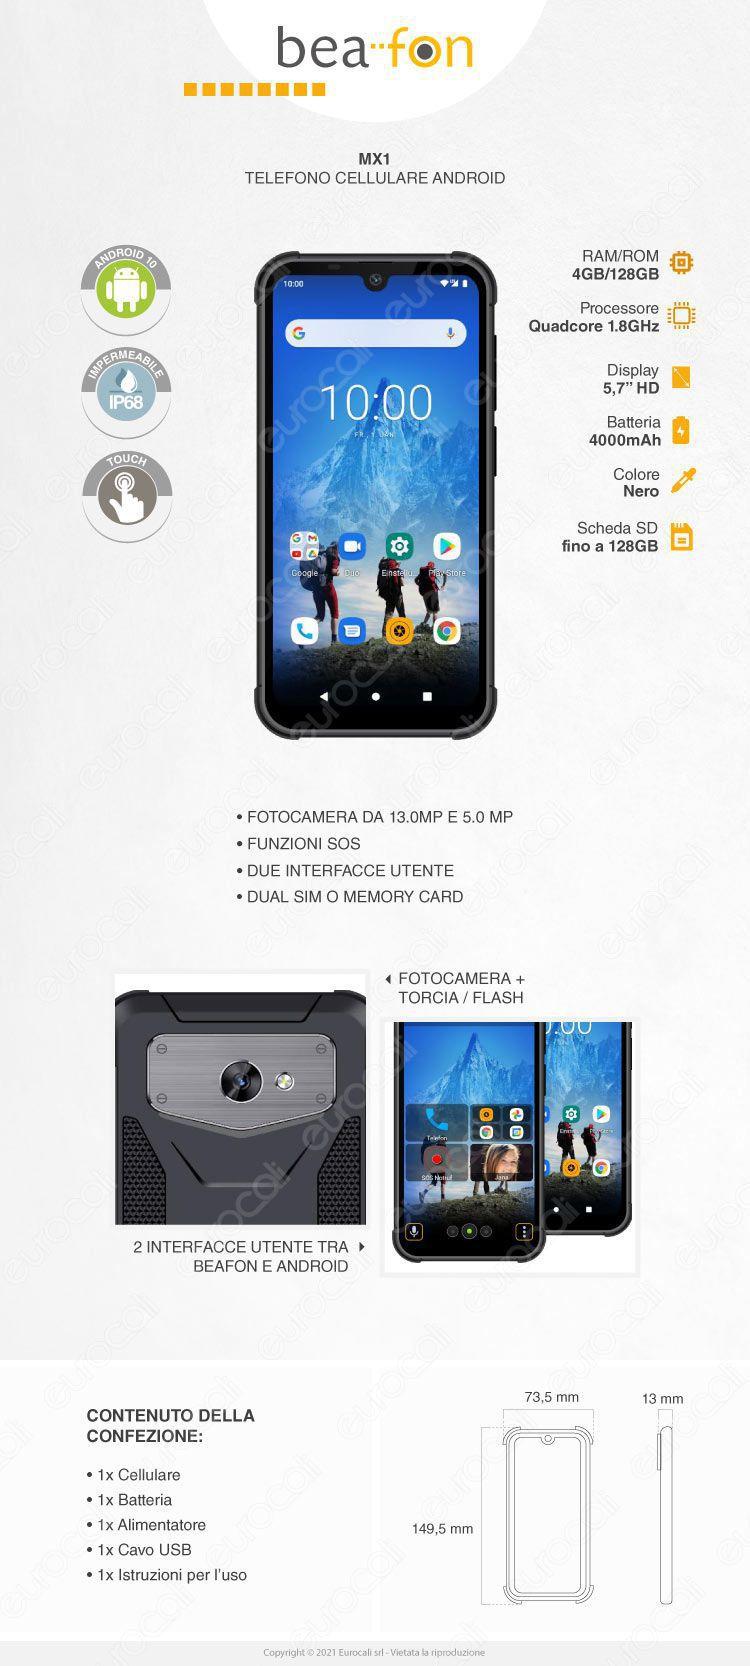 smartphone Mx1 Beafon Android